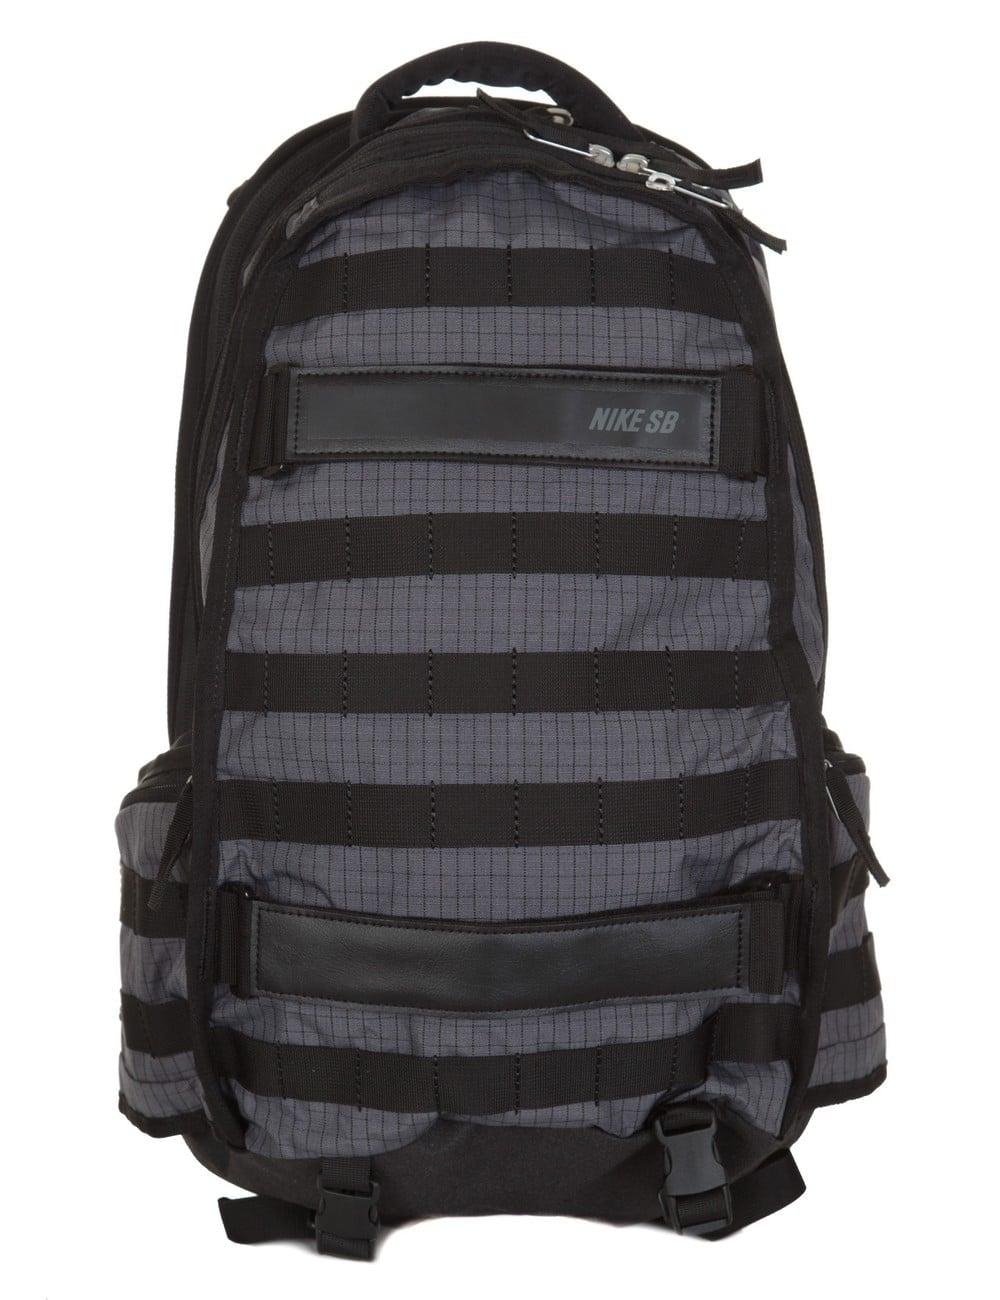 39d215a6f3 Nike SB RPM Backpack - Dark Grey Black - Bag Shop from Fat Buddha ...